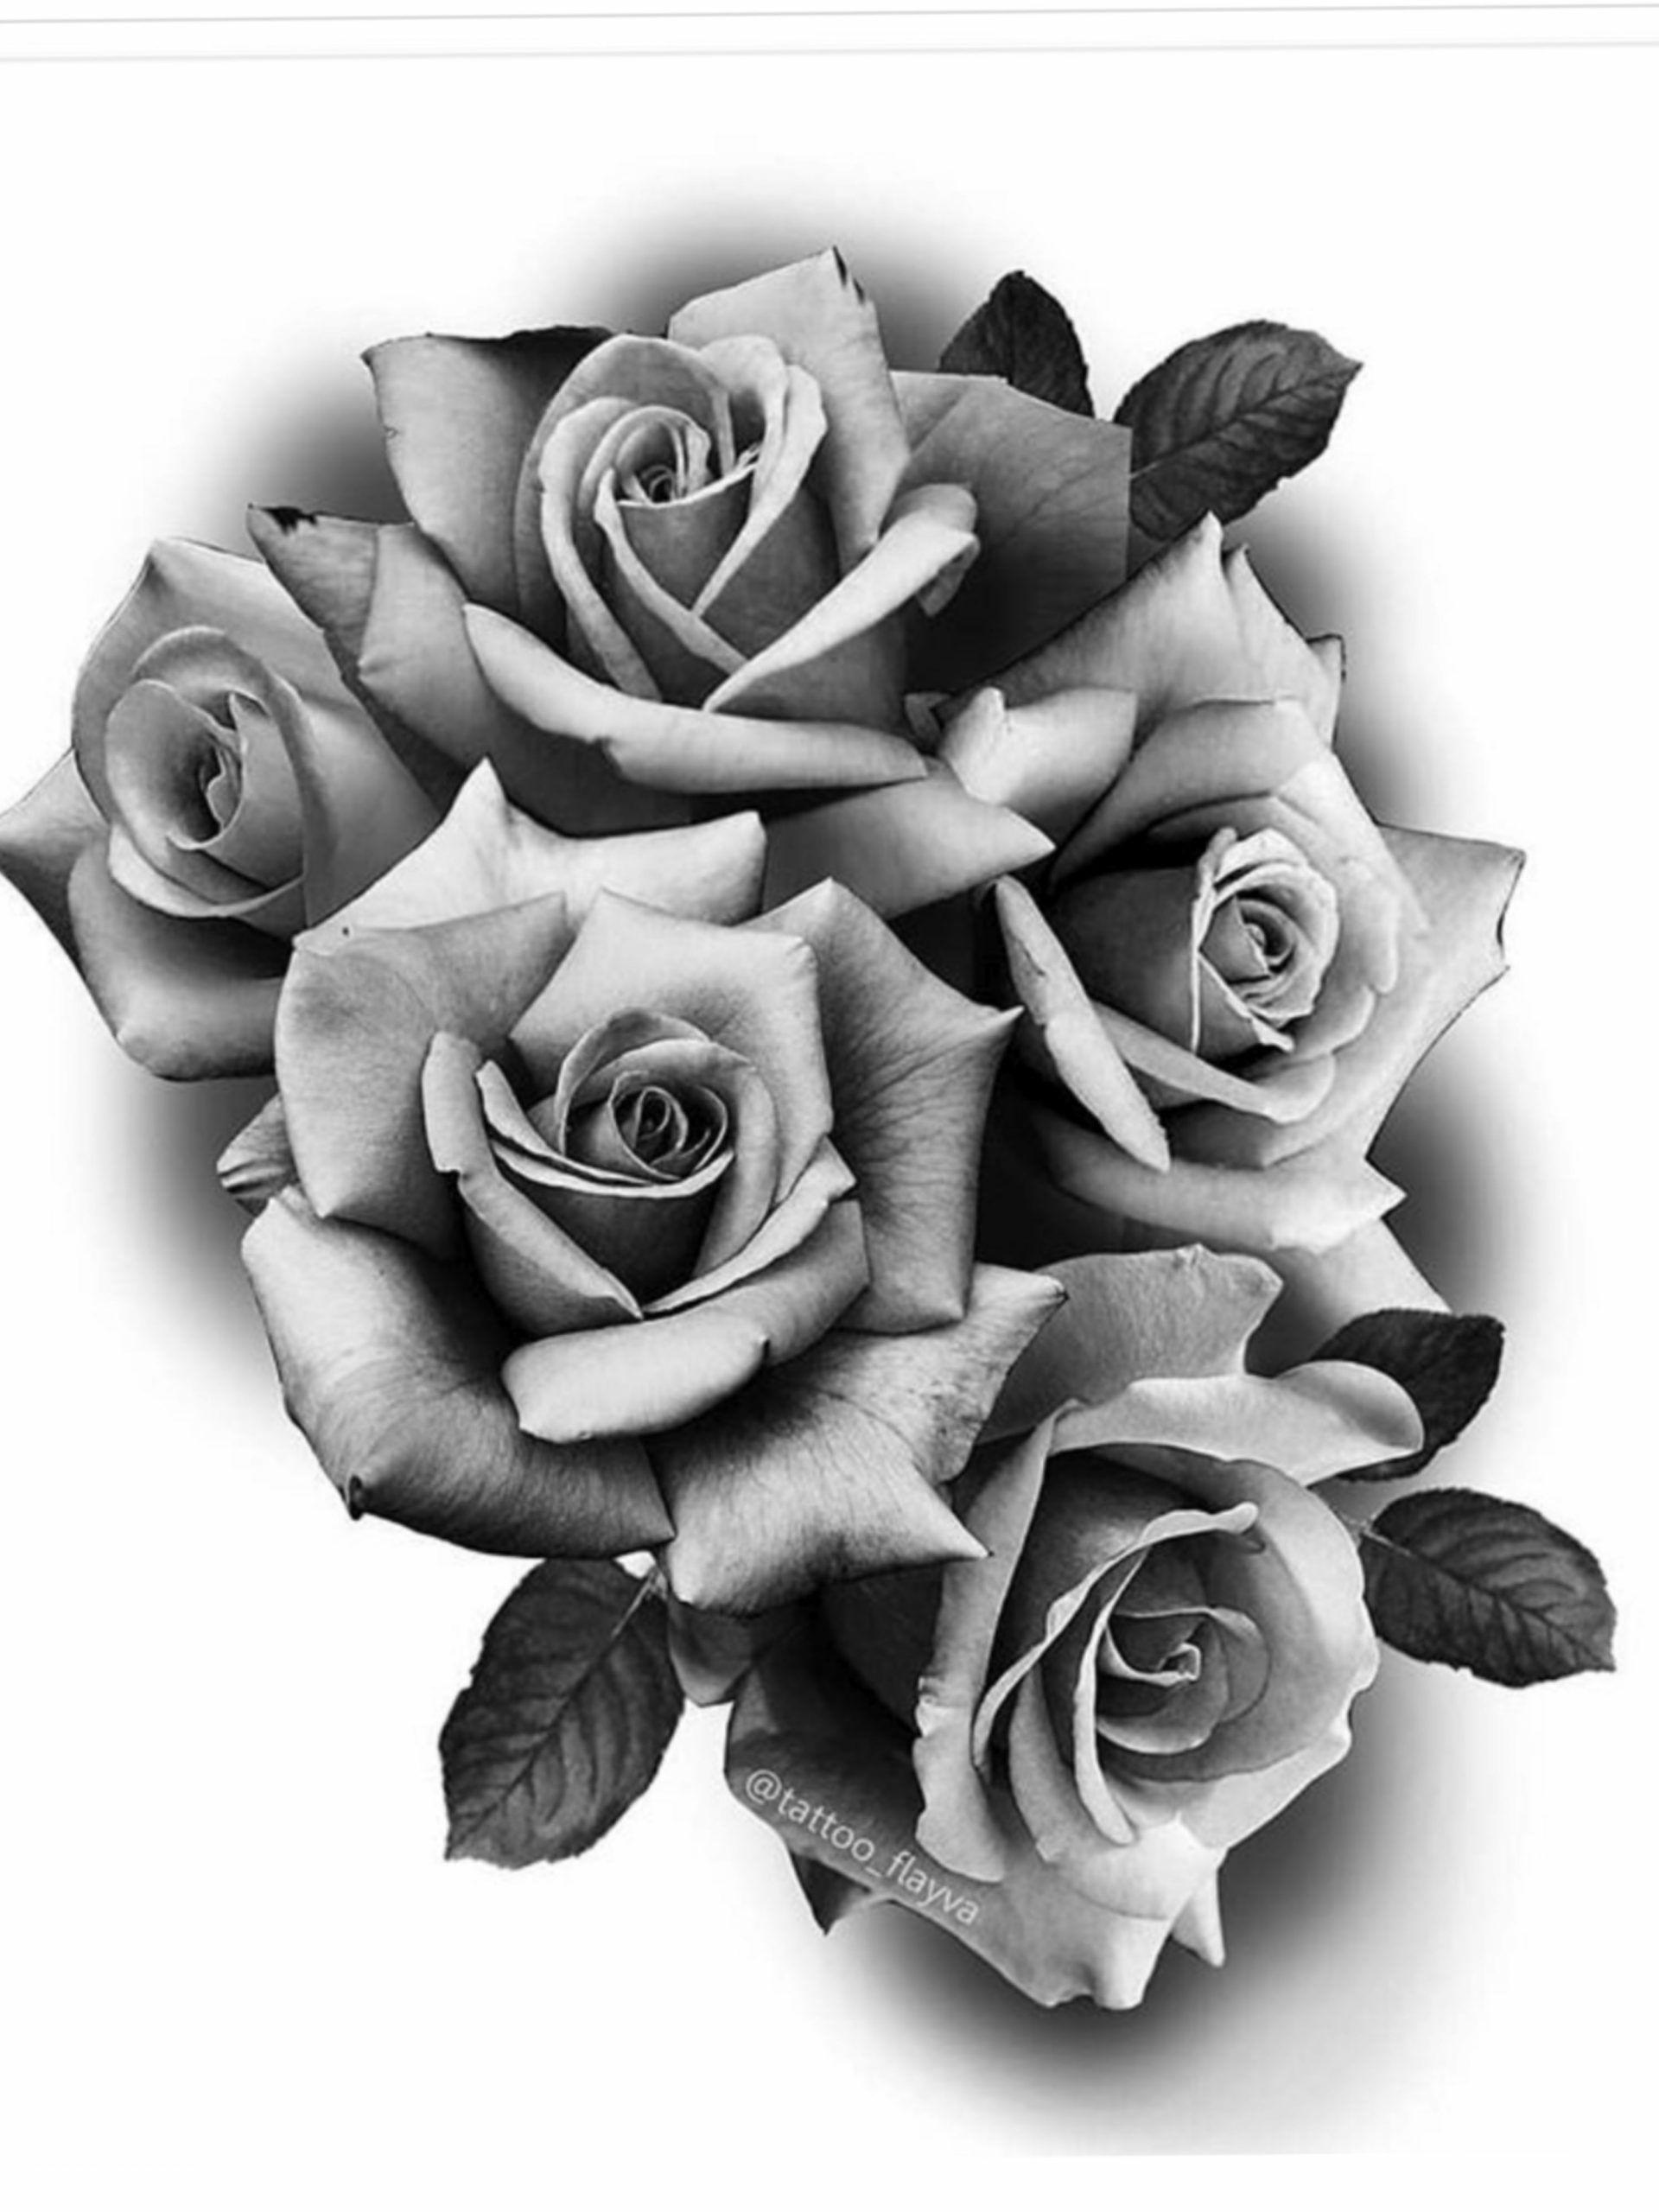 Tattoo Roses Templates Roses Tattoo Templates In 2020 Realistic Rose Tattoo Rose Drawing Tattoo Rose Flower Tattoos